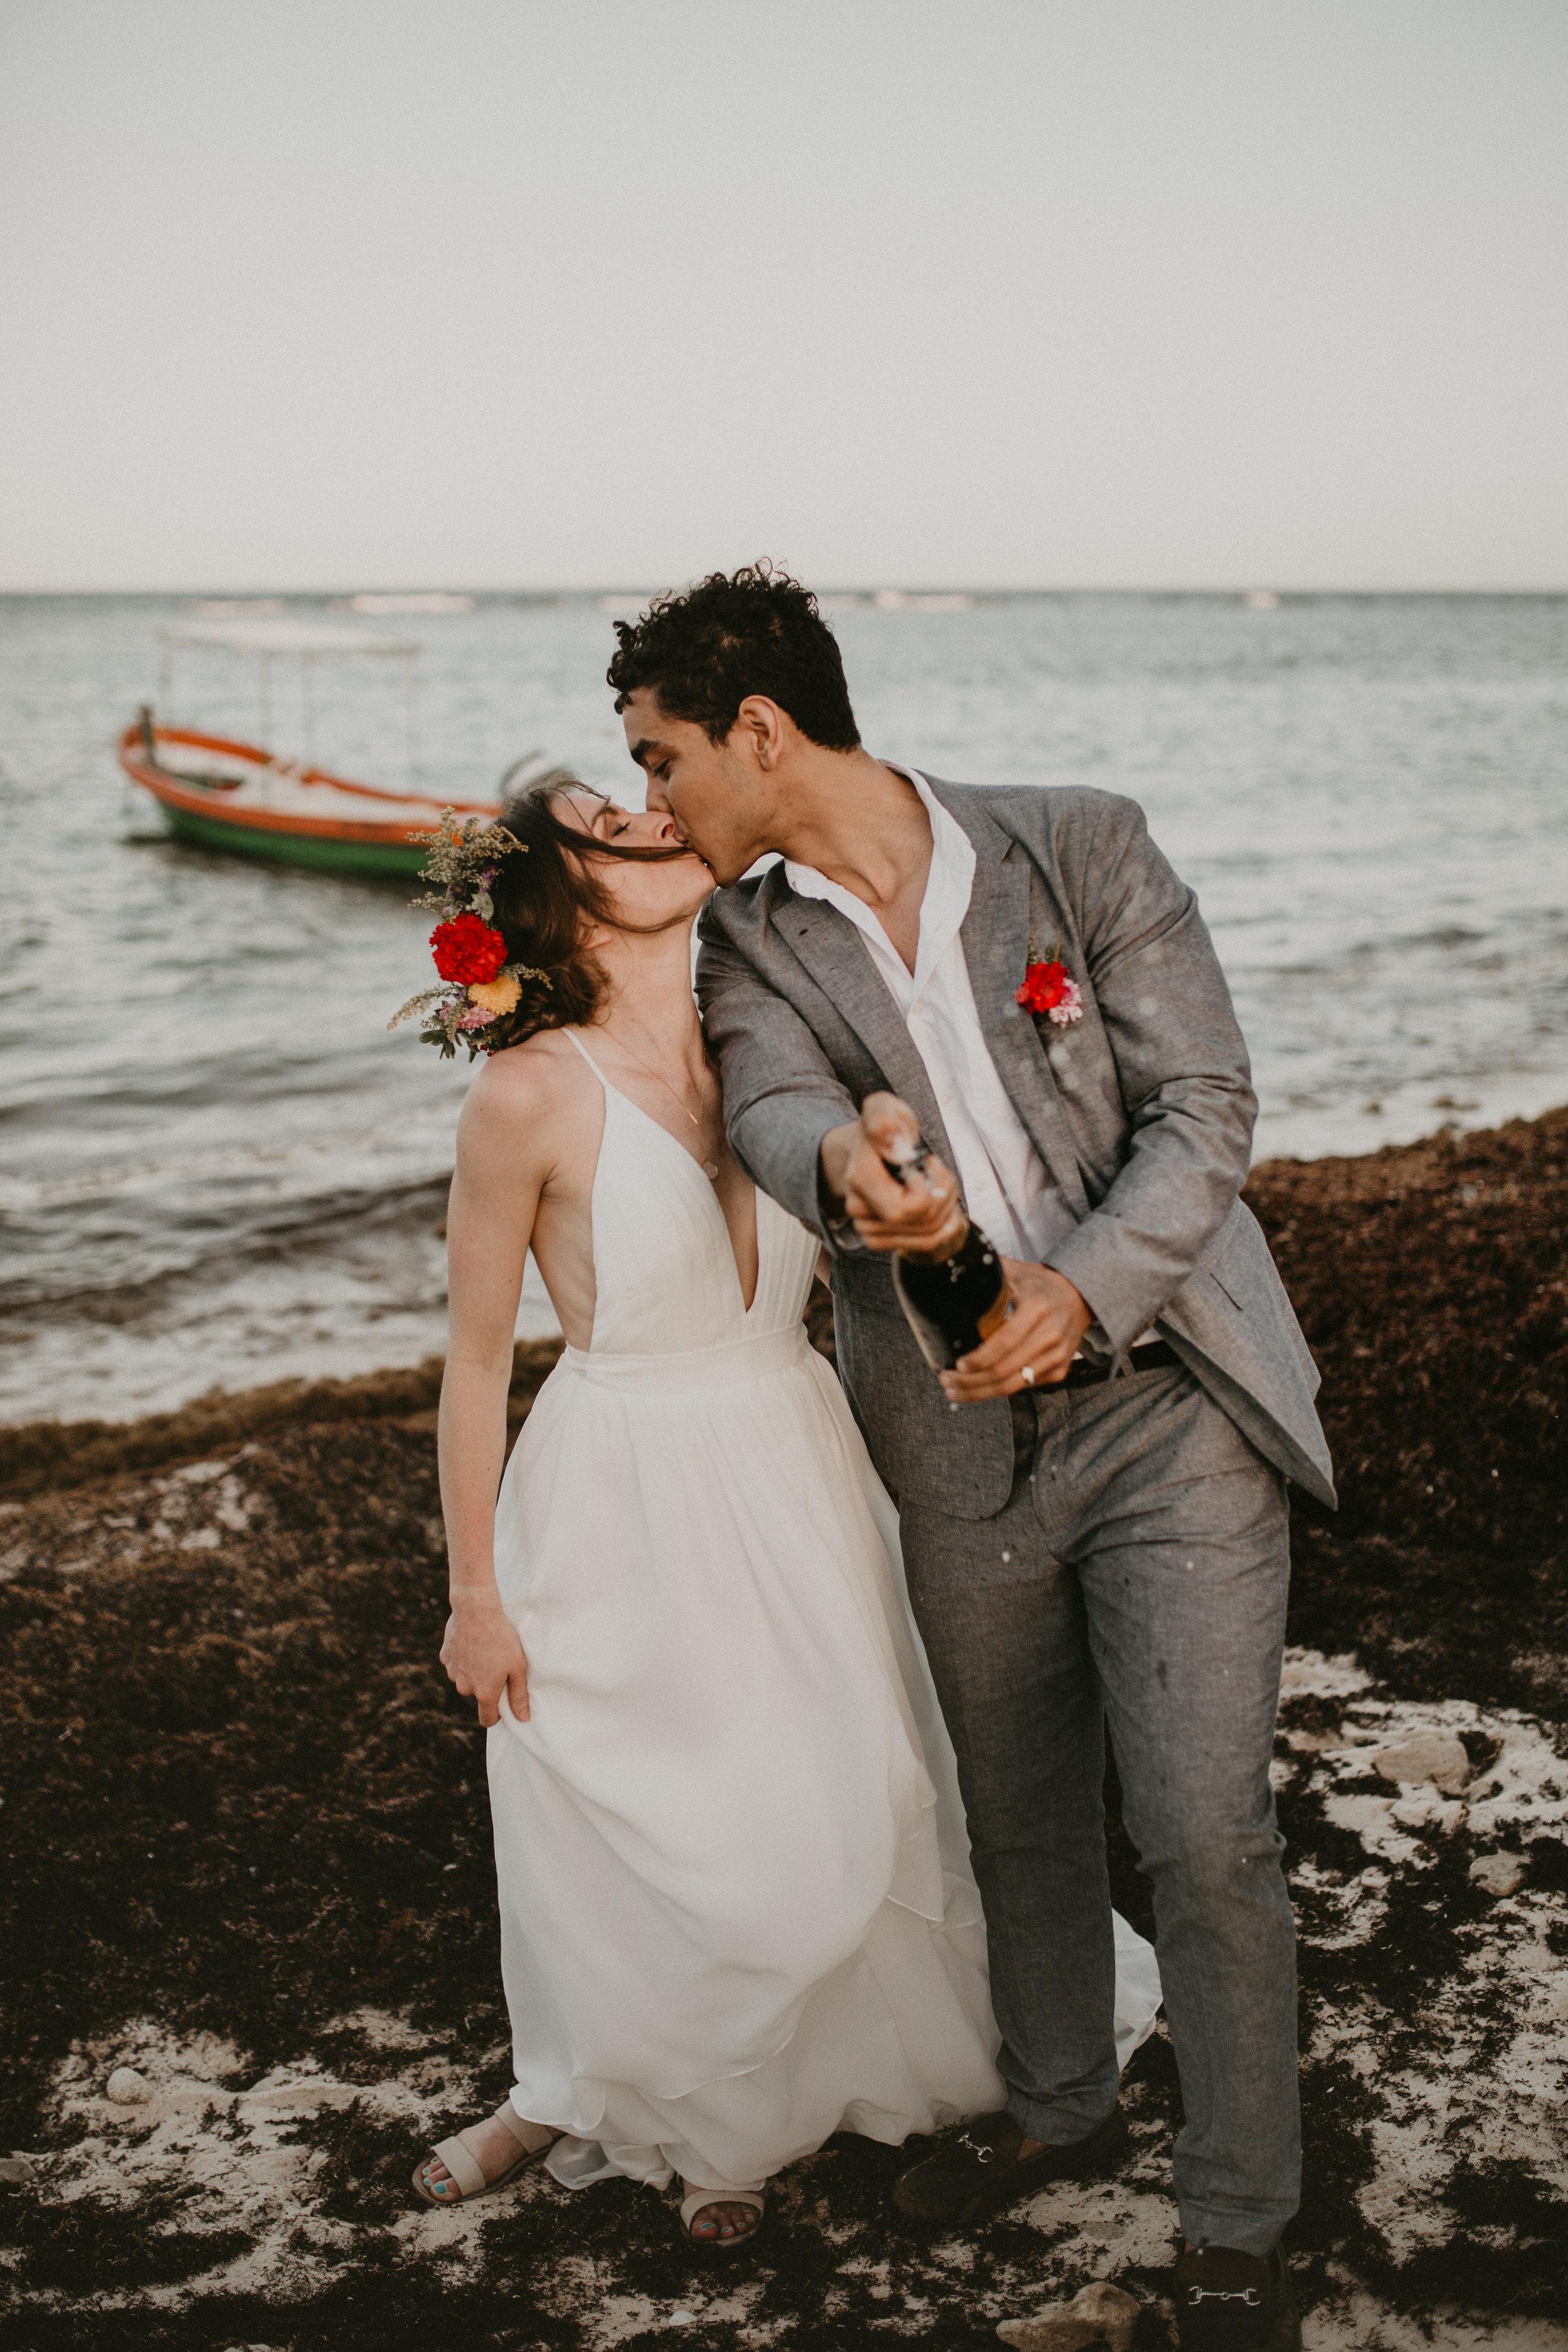 Nicole-Daacke-Photography-beachfront-akumal-destionation-wedding-tulum-mexico-elopement-photographer-destination-wedding-inspiration-sunset-champagne-pop-boho-bride-ocean-tropical-bohemian-tulum-wedding-photos-195.jpg